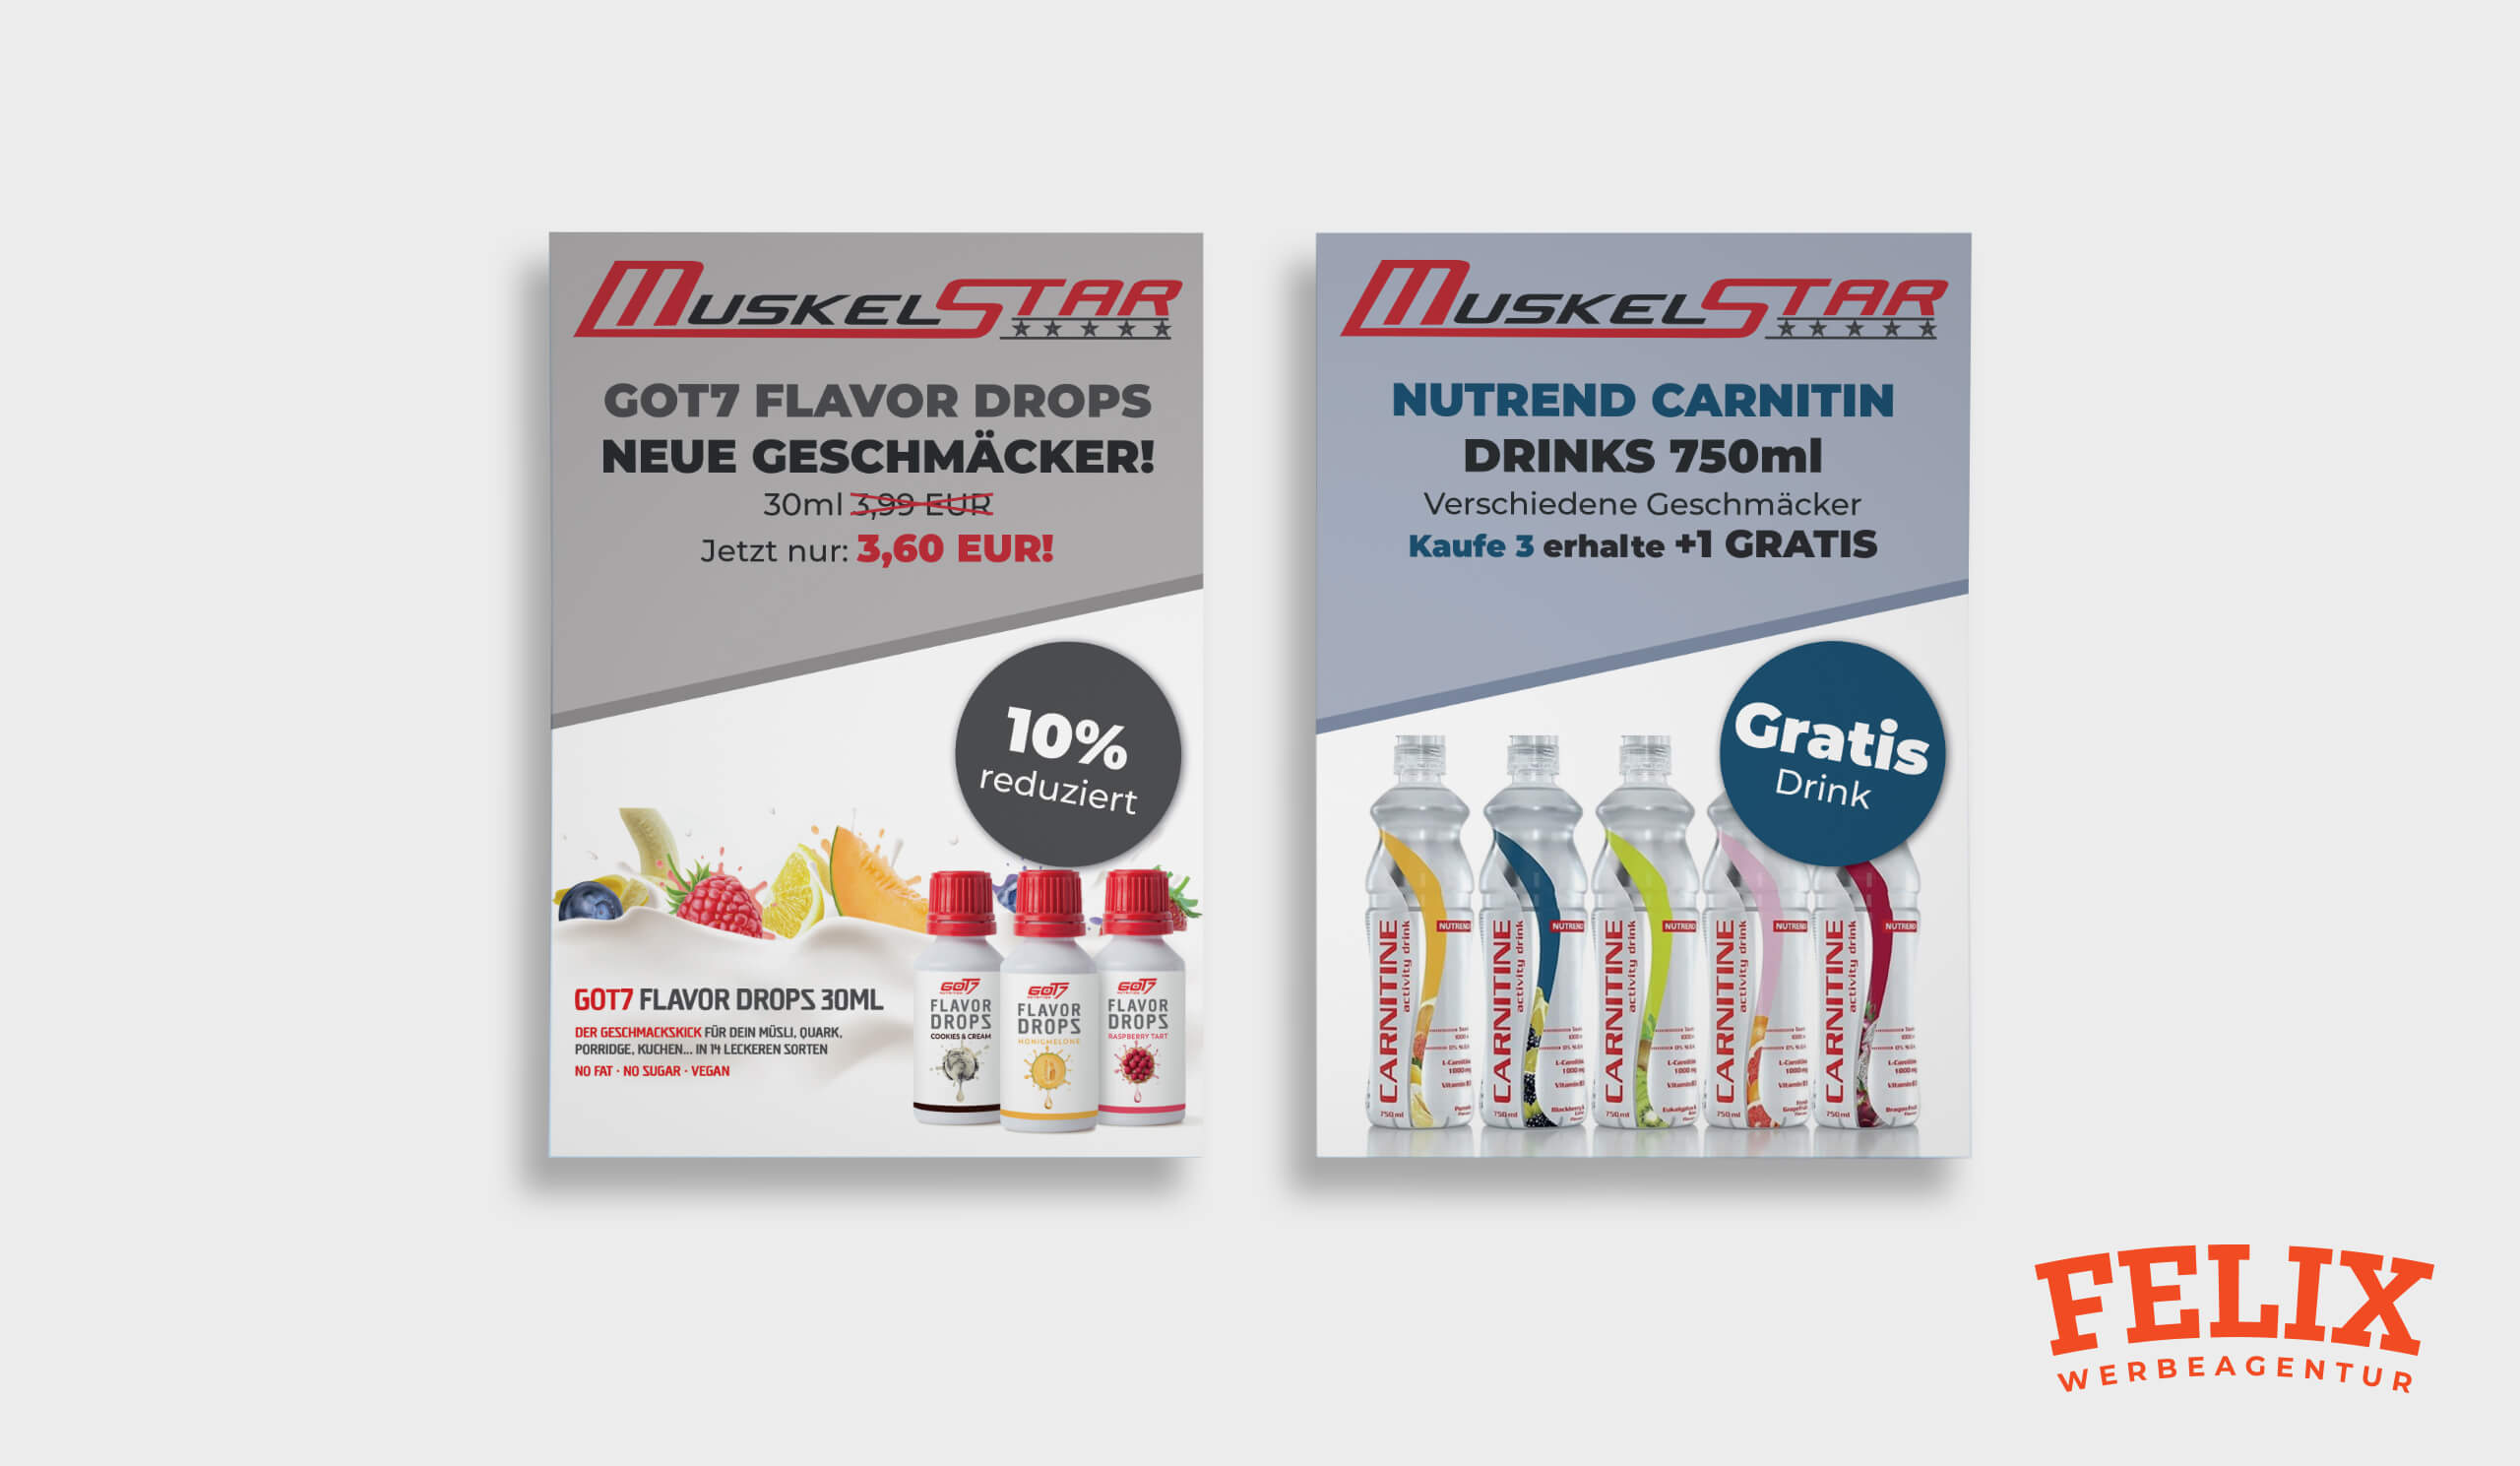 Mockup_Muskelstar GmbH_Plakate_02